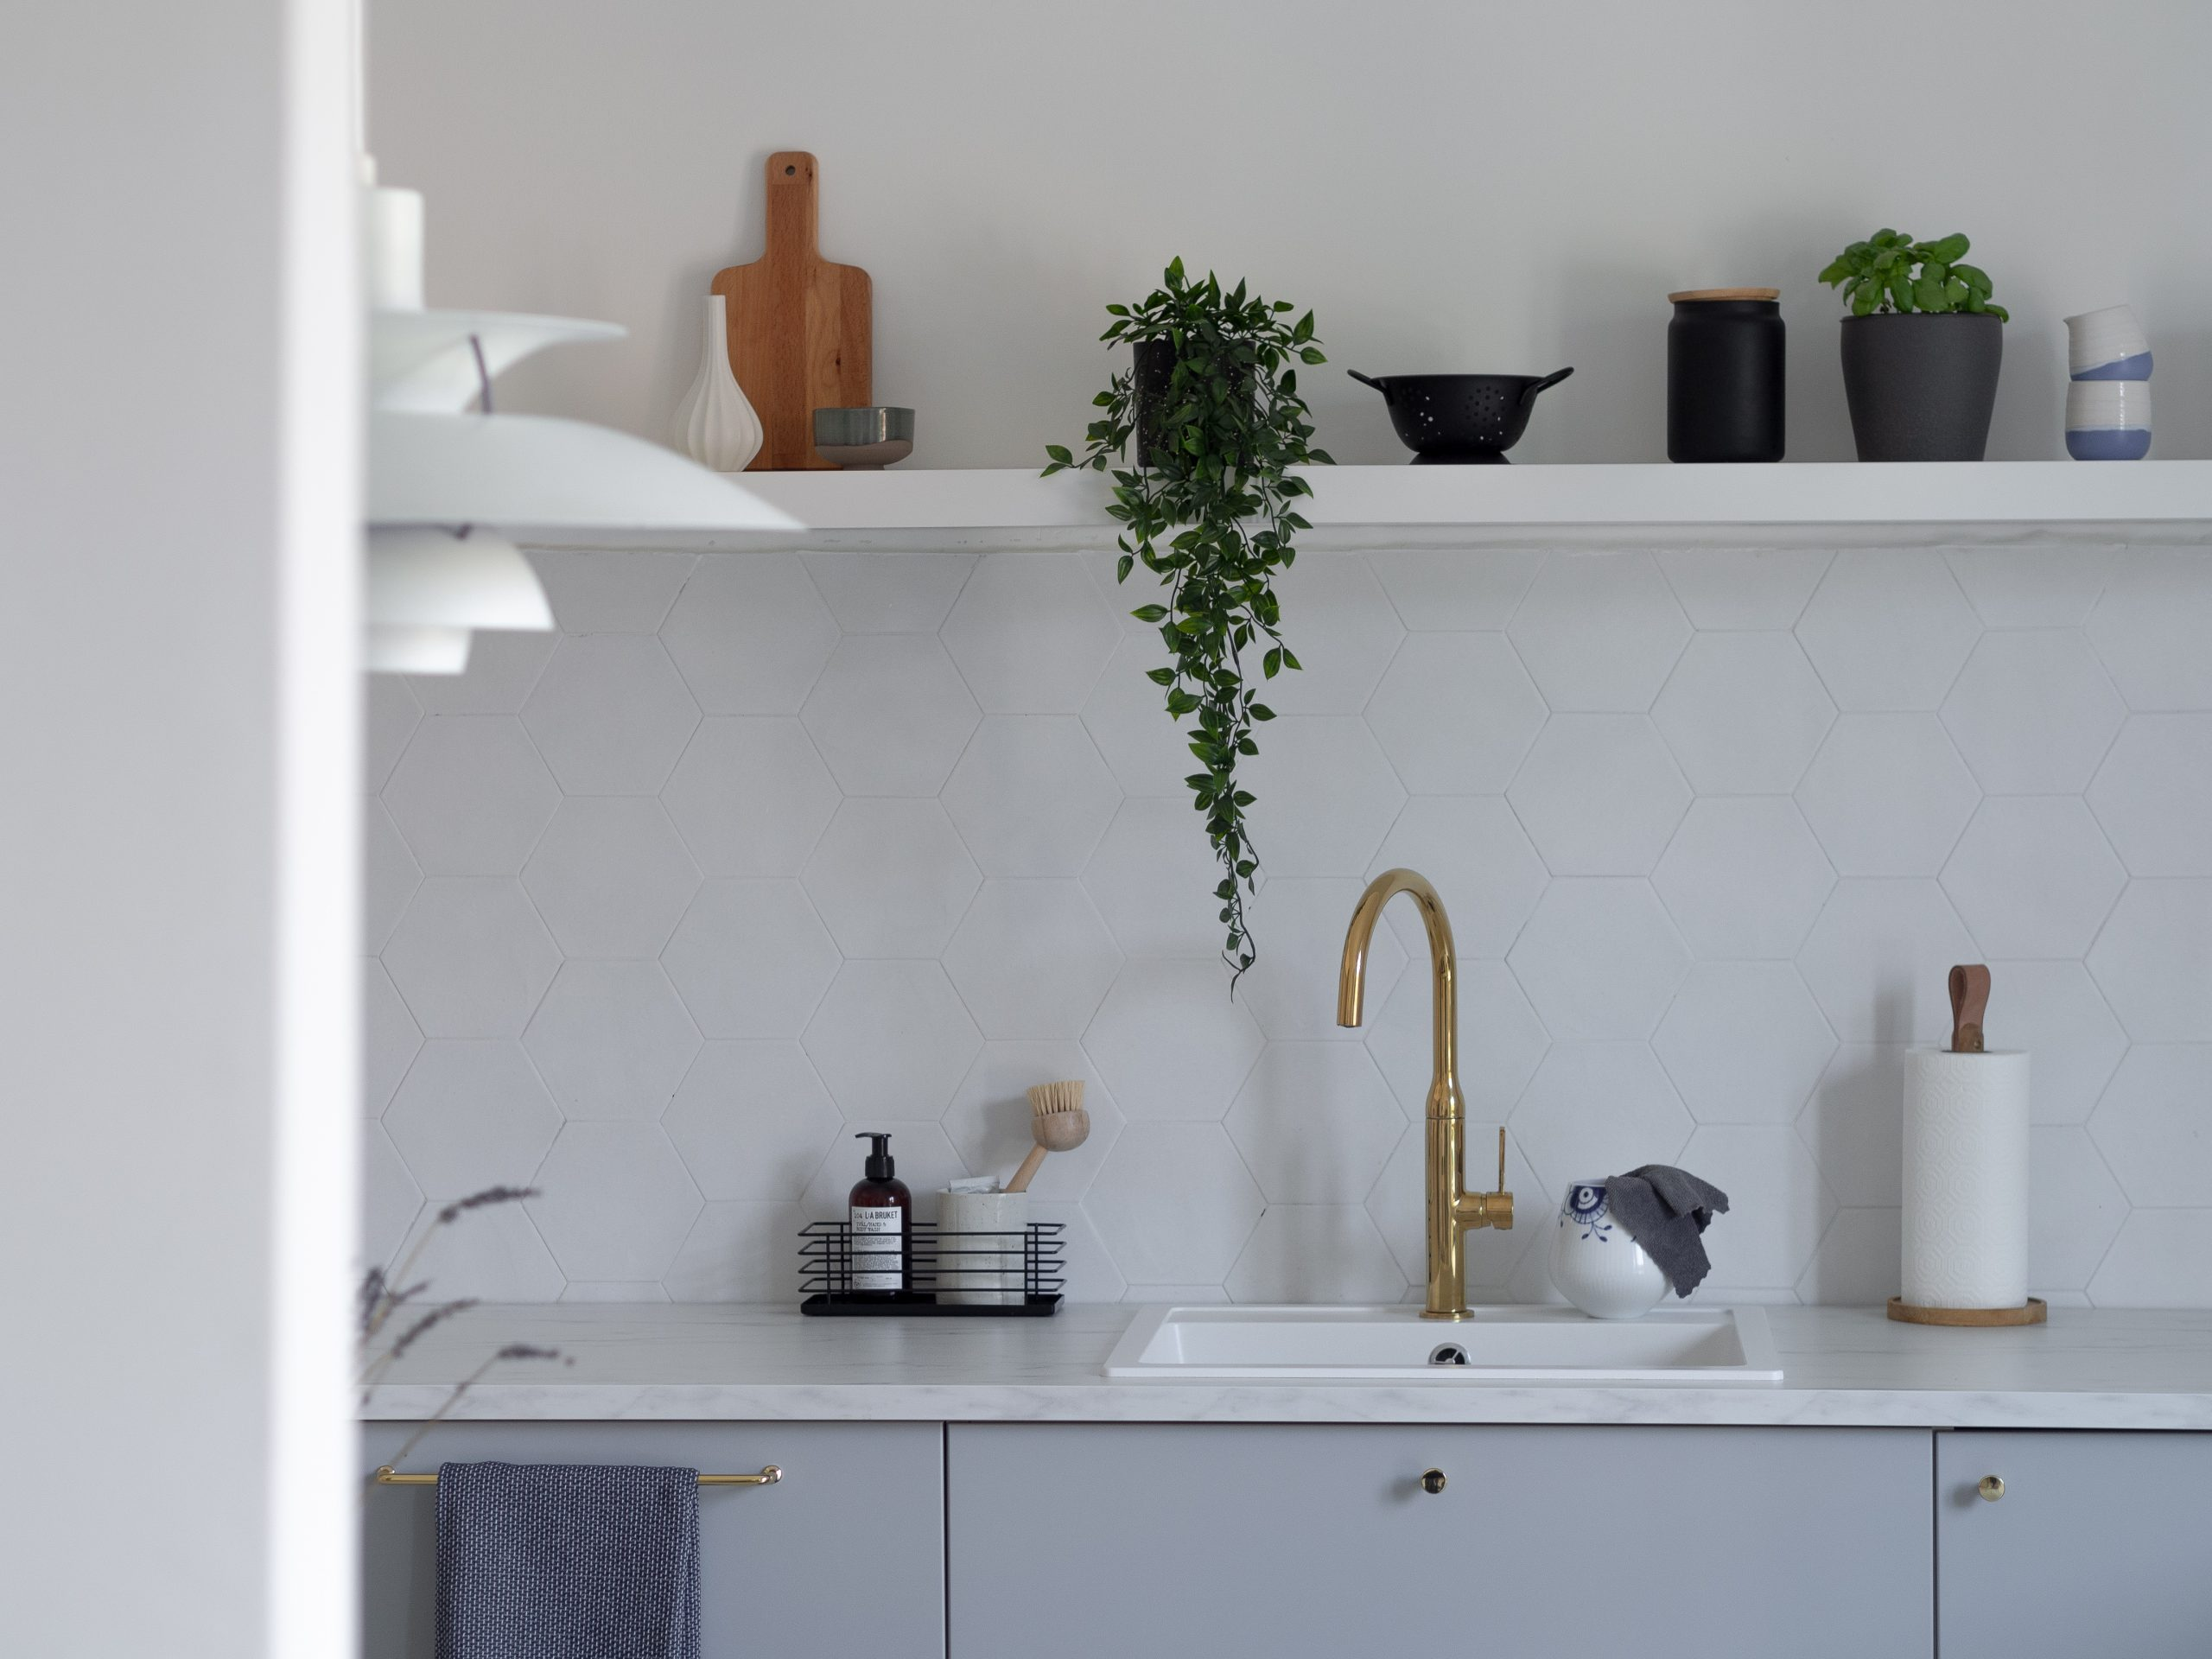 Scandinavian vibes in the home of Ingrid Opstad